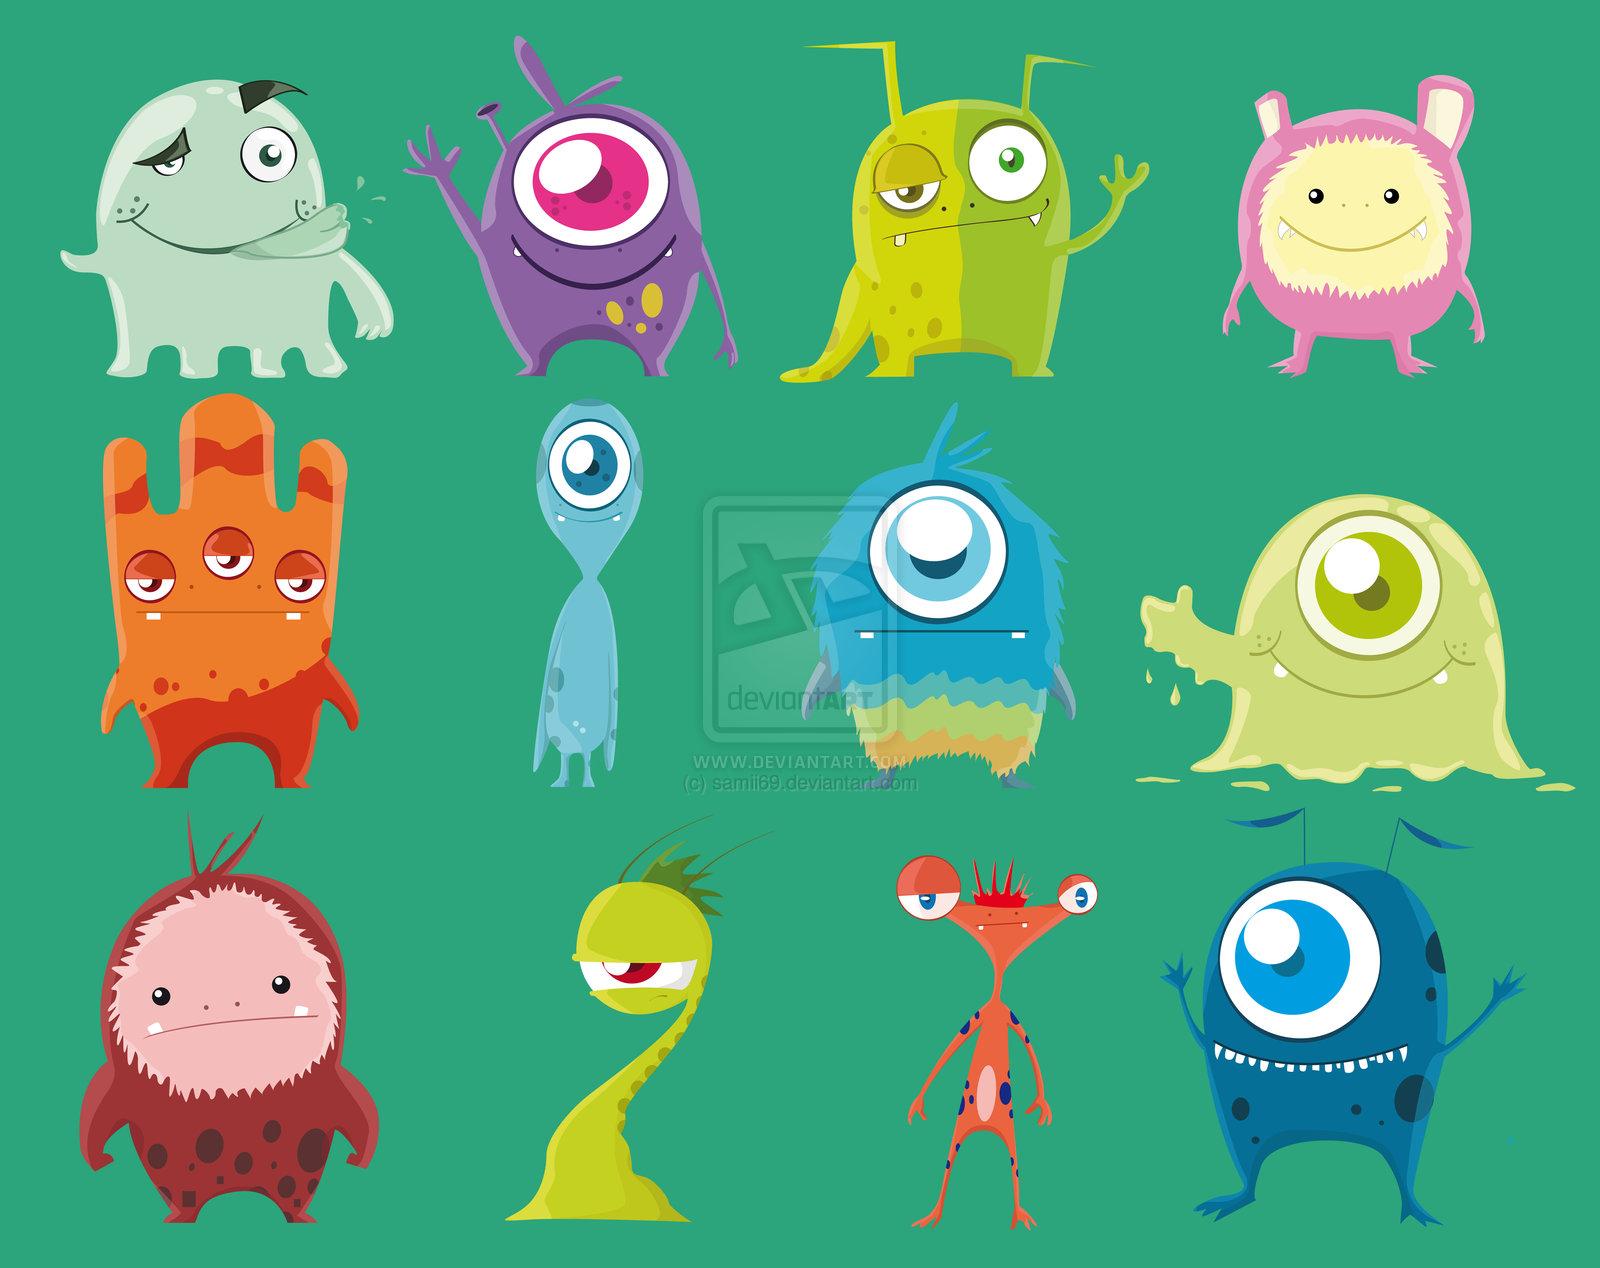 Cute Animated Monster Wallpaper